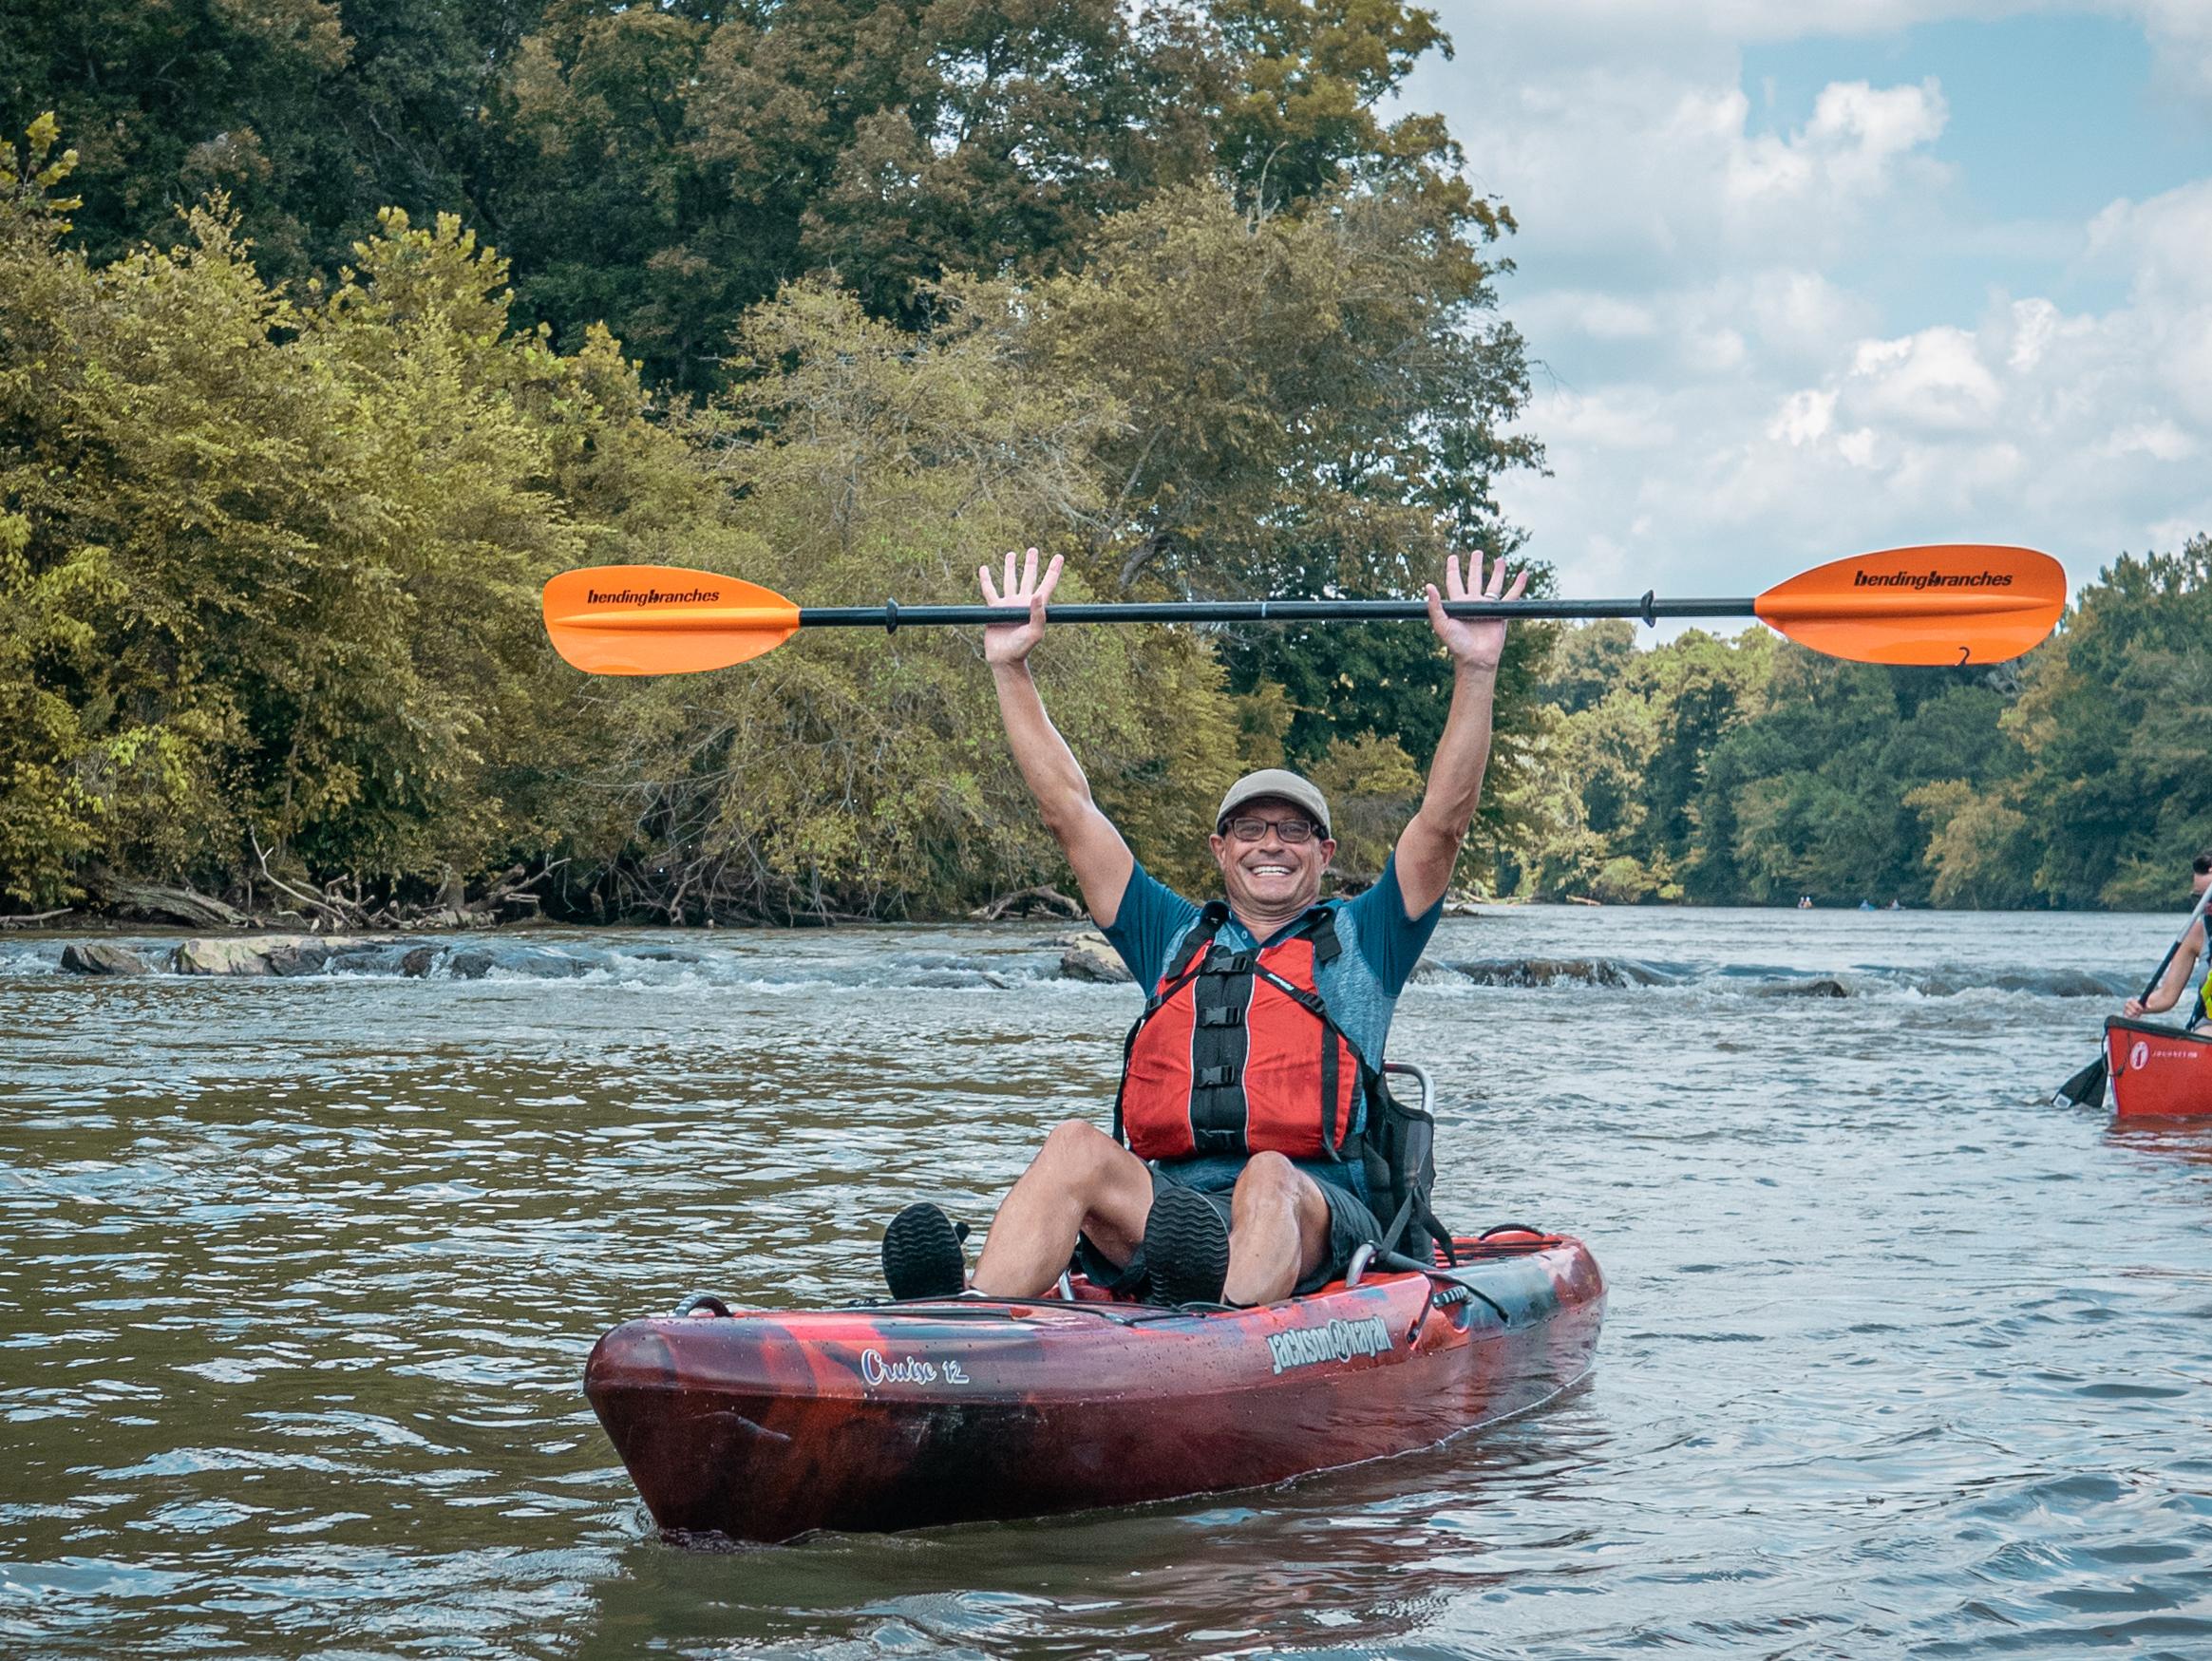 Man in kayak raises paddle and smiles